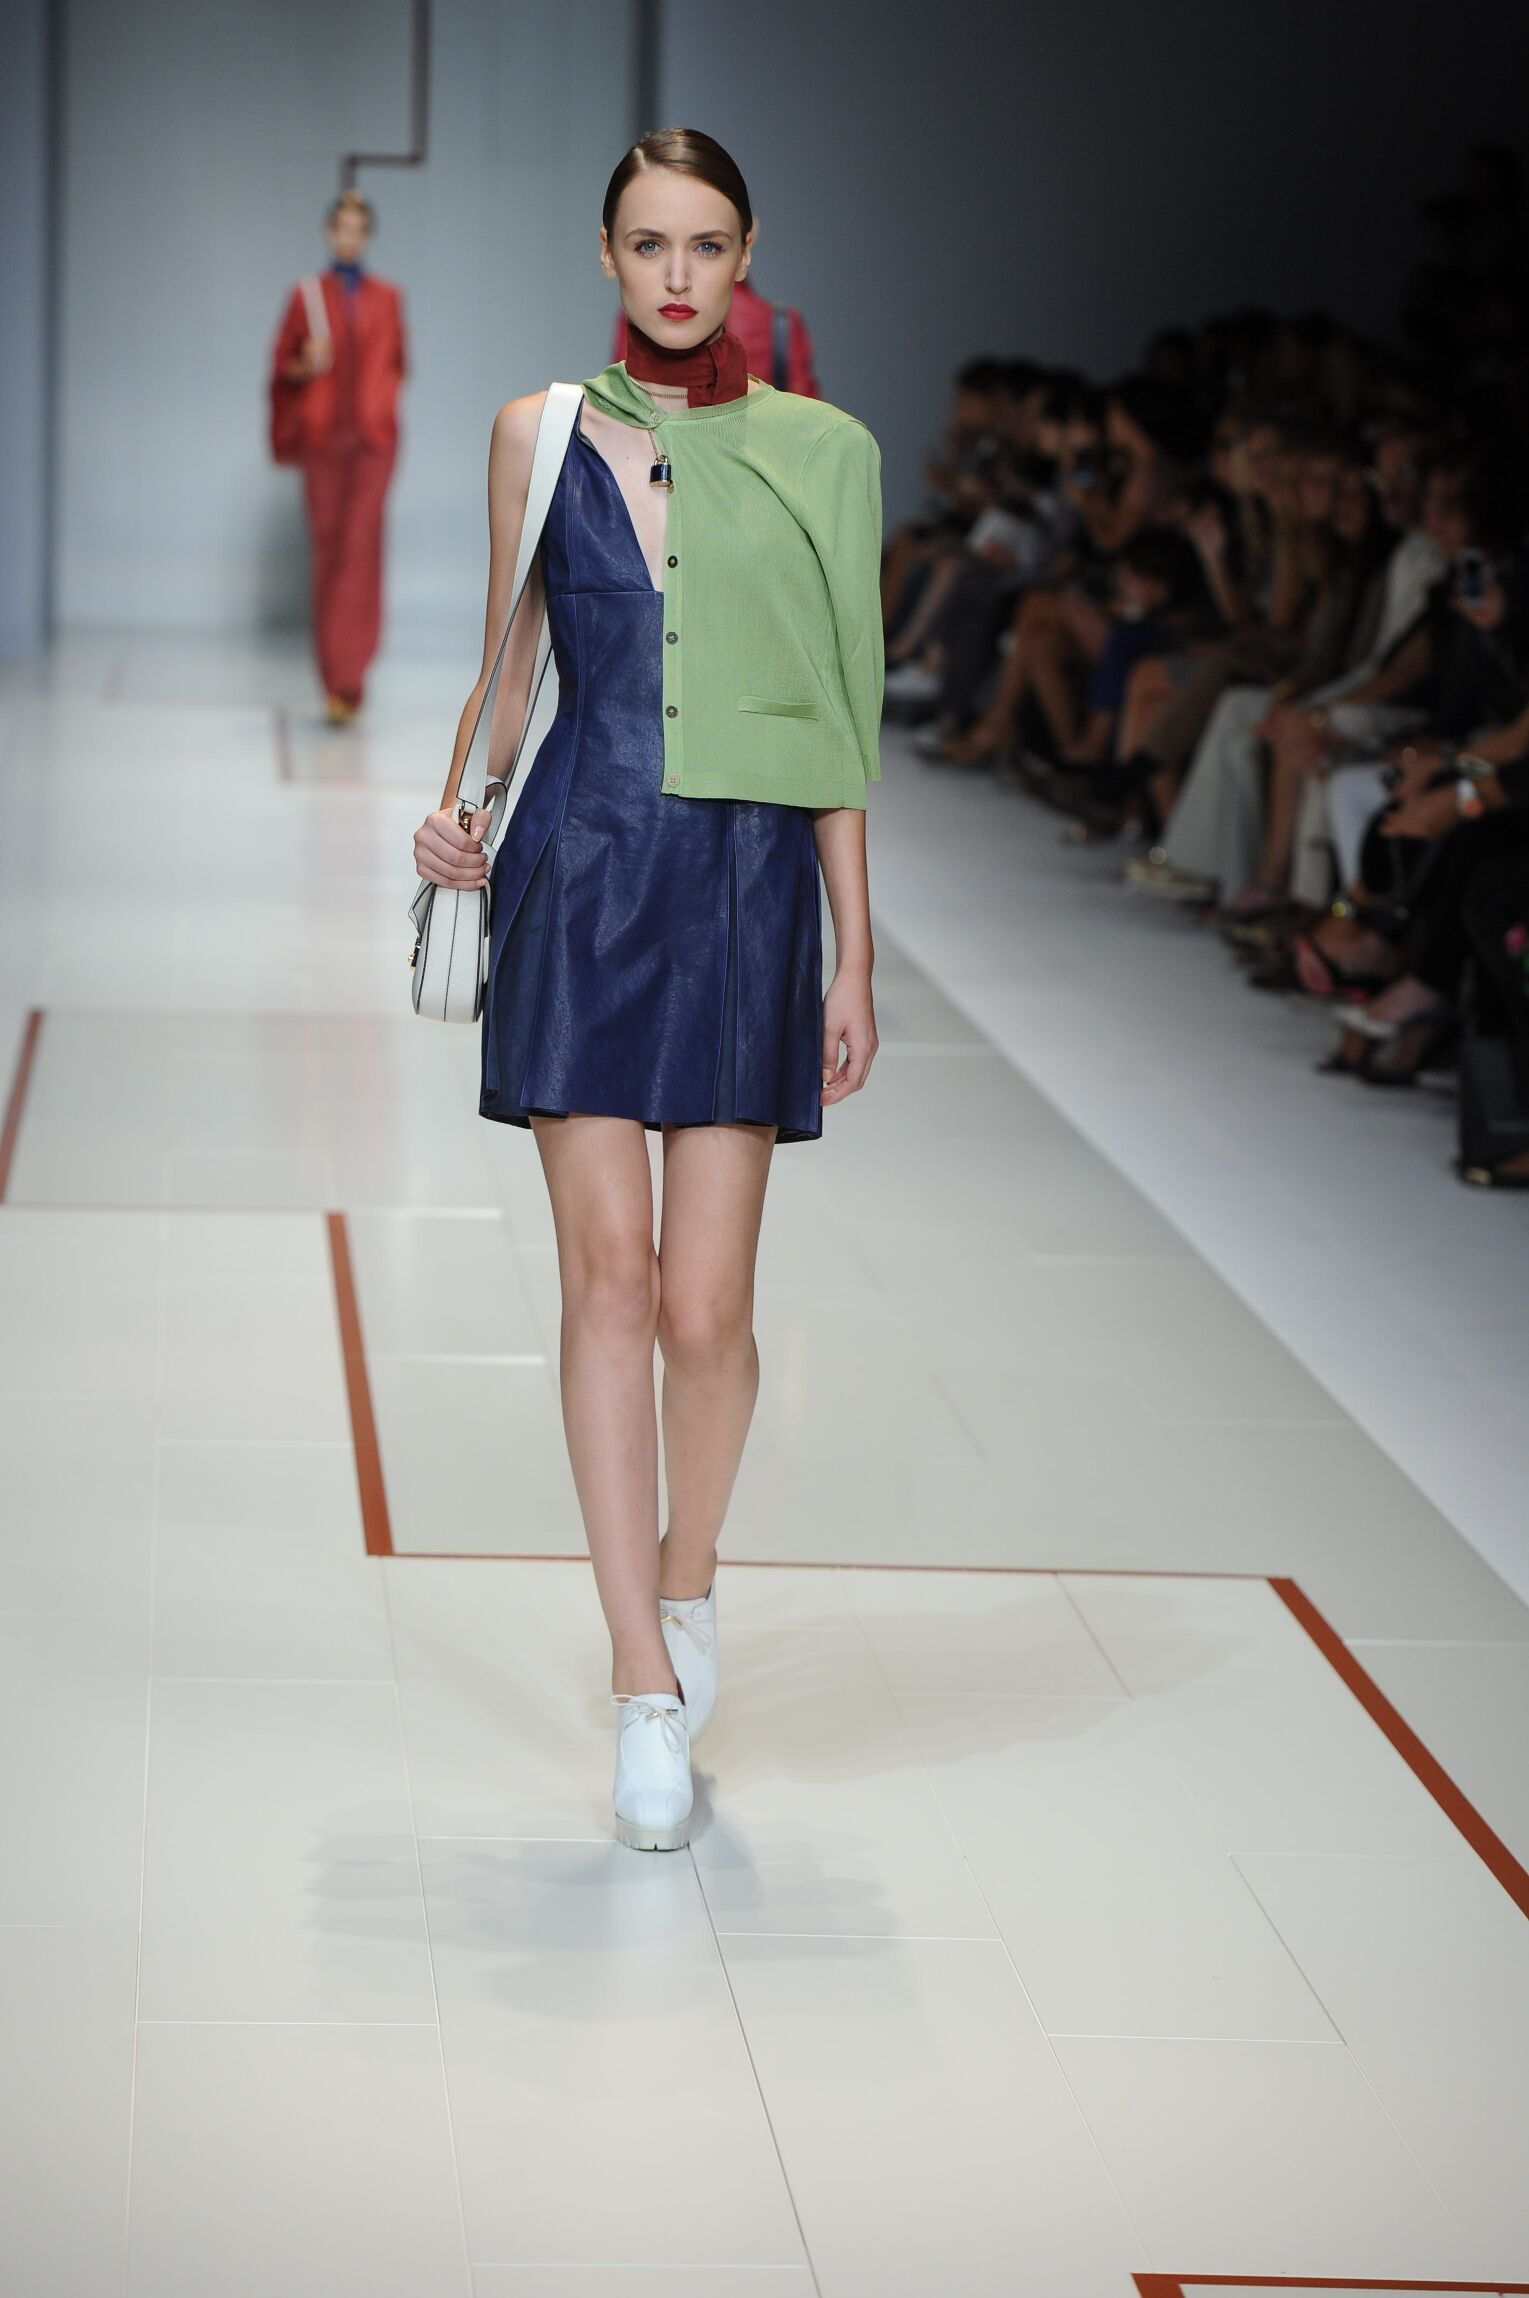 Trussardi SS 2015 Womenswear